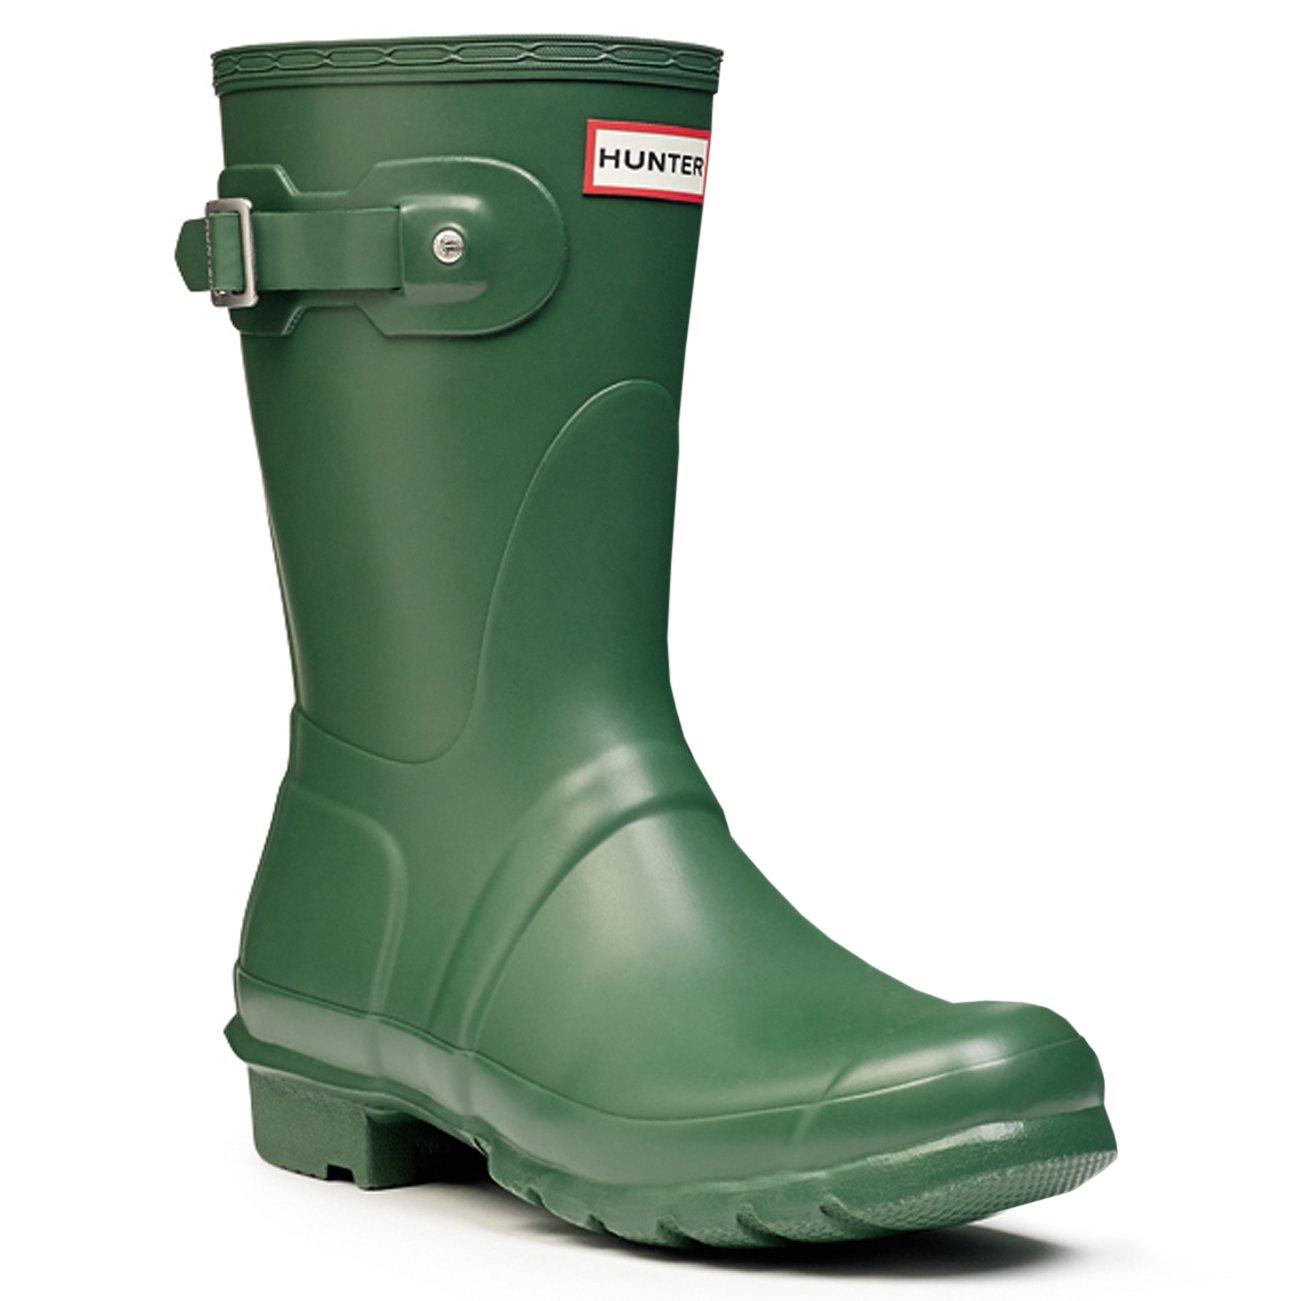 Womens Hunter Original Short Wellington Rainboots Snow Waterproof Wellie - Hunter Green - 7